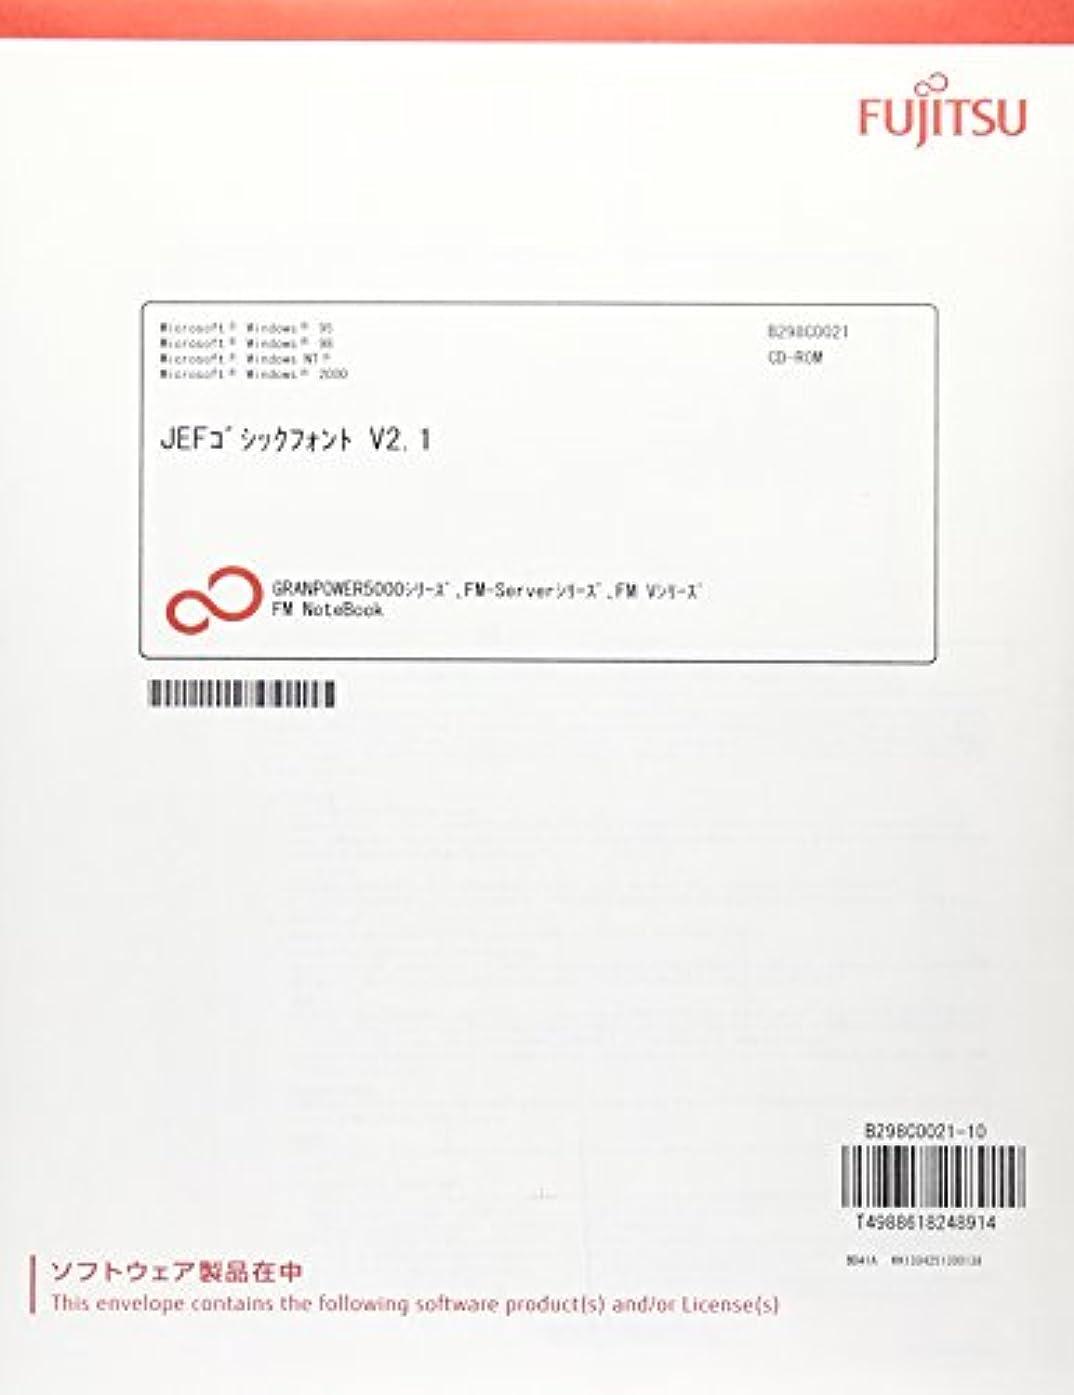 JEFゴシックフォント V2.1 L10